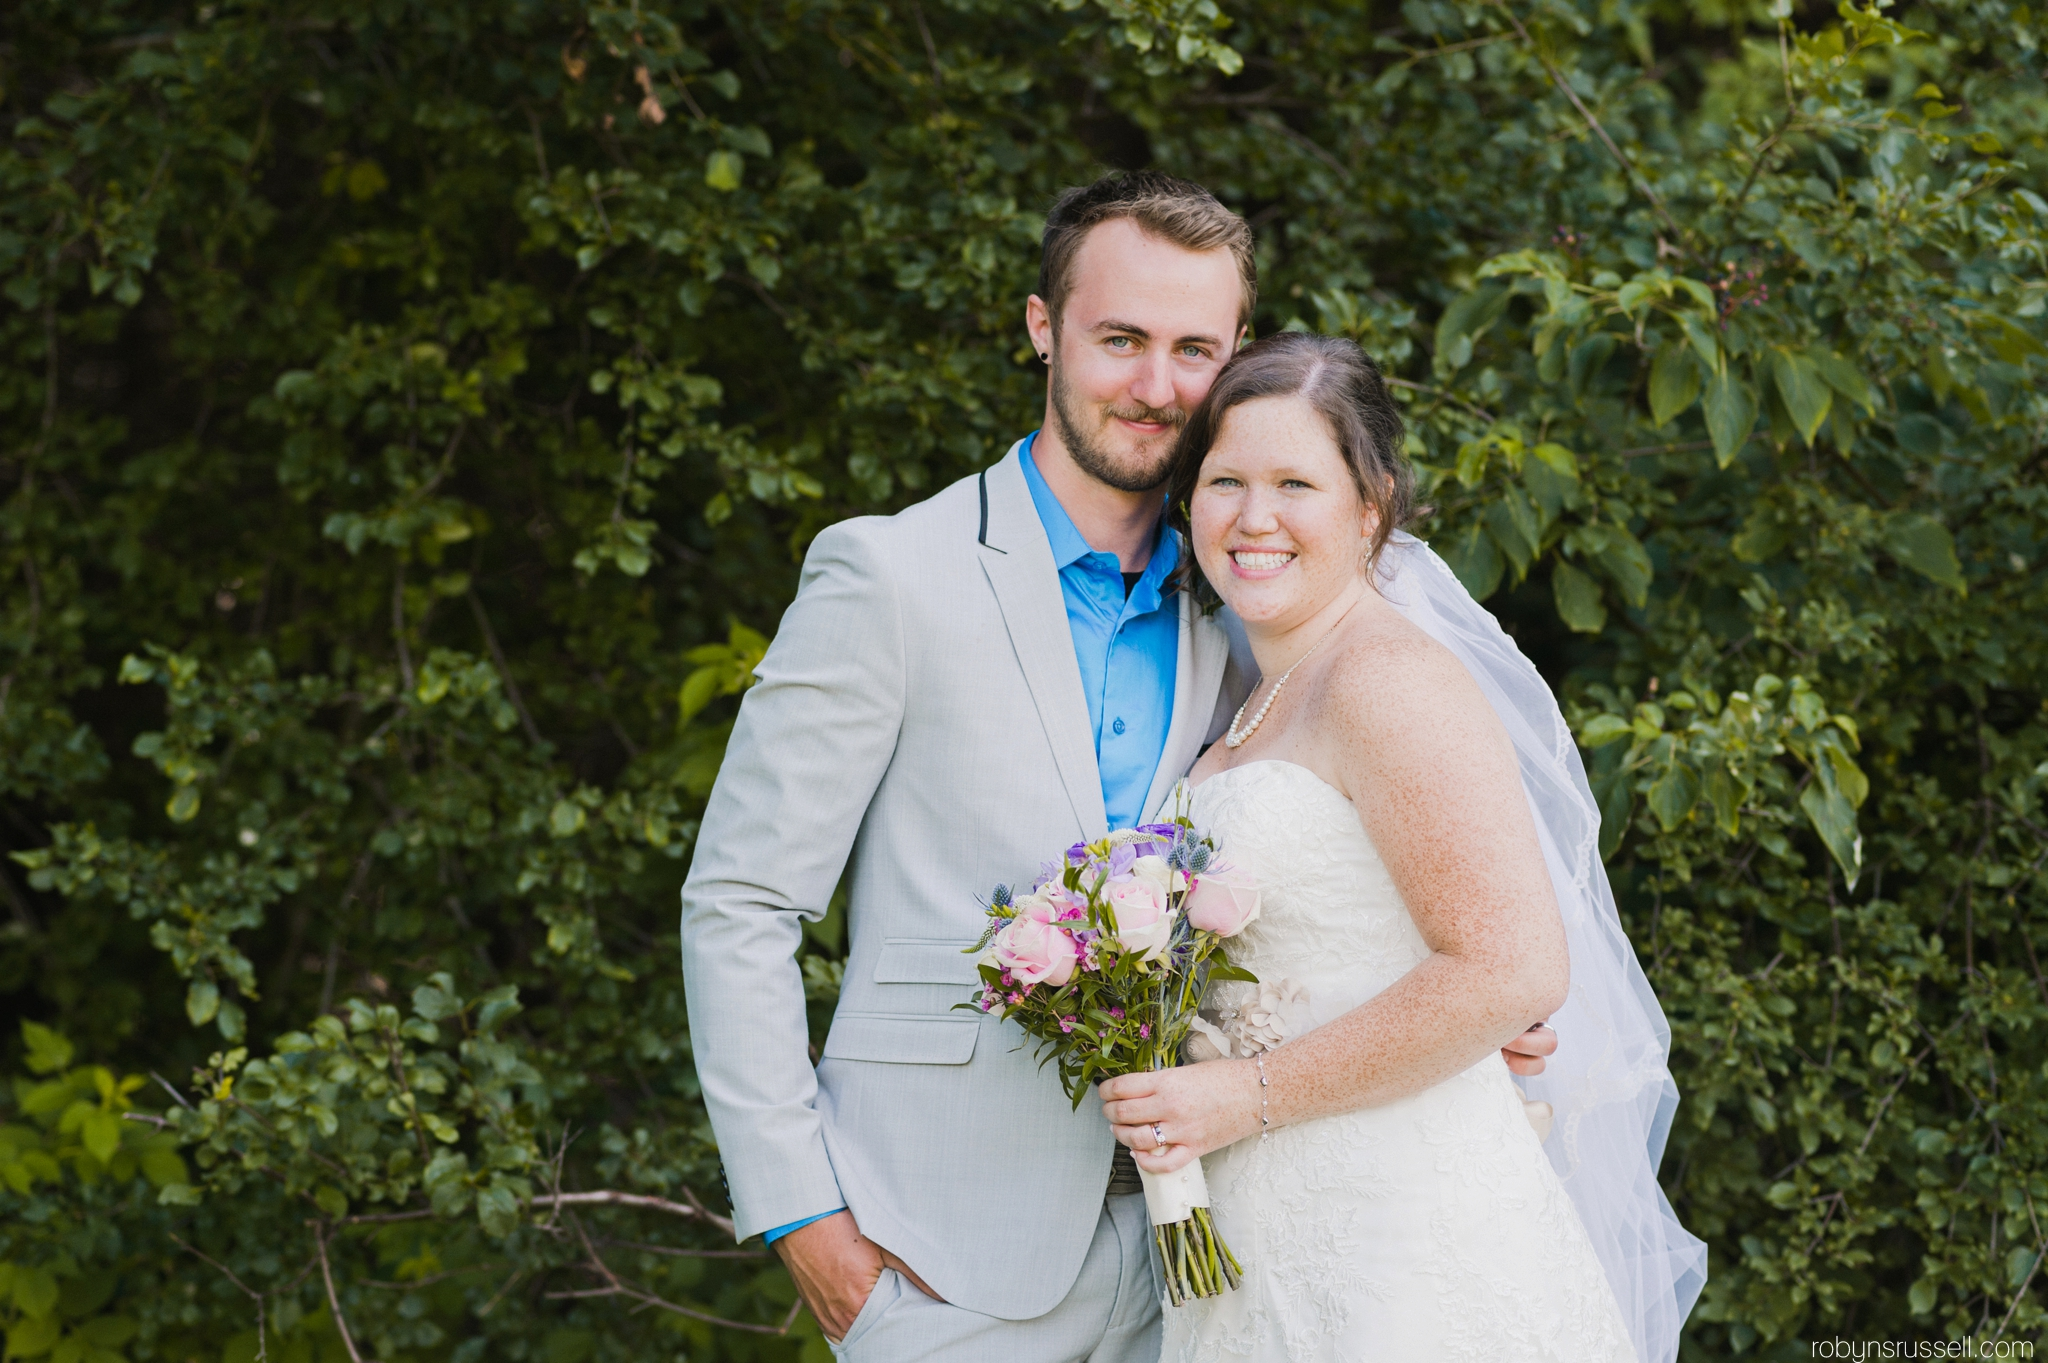 36-beautiful-bride-and-groom-on-wedding-day.jpg